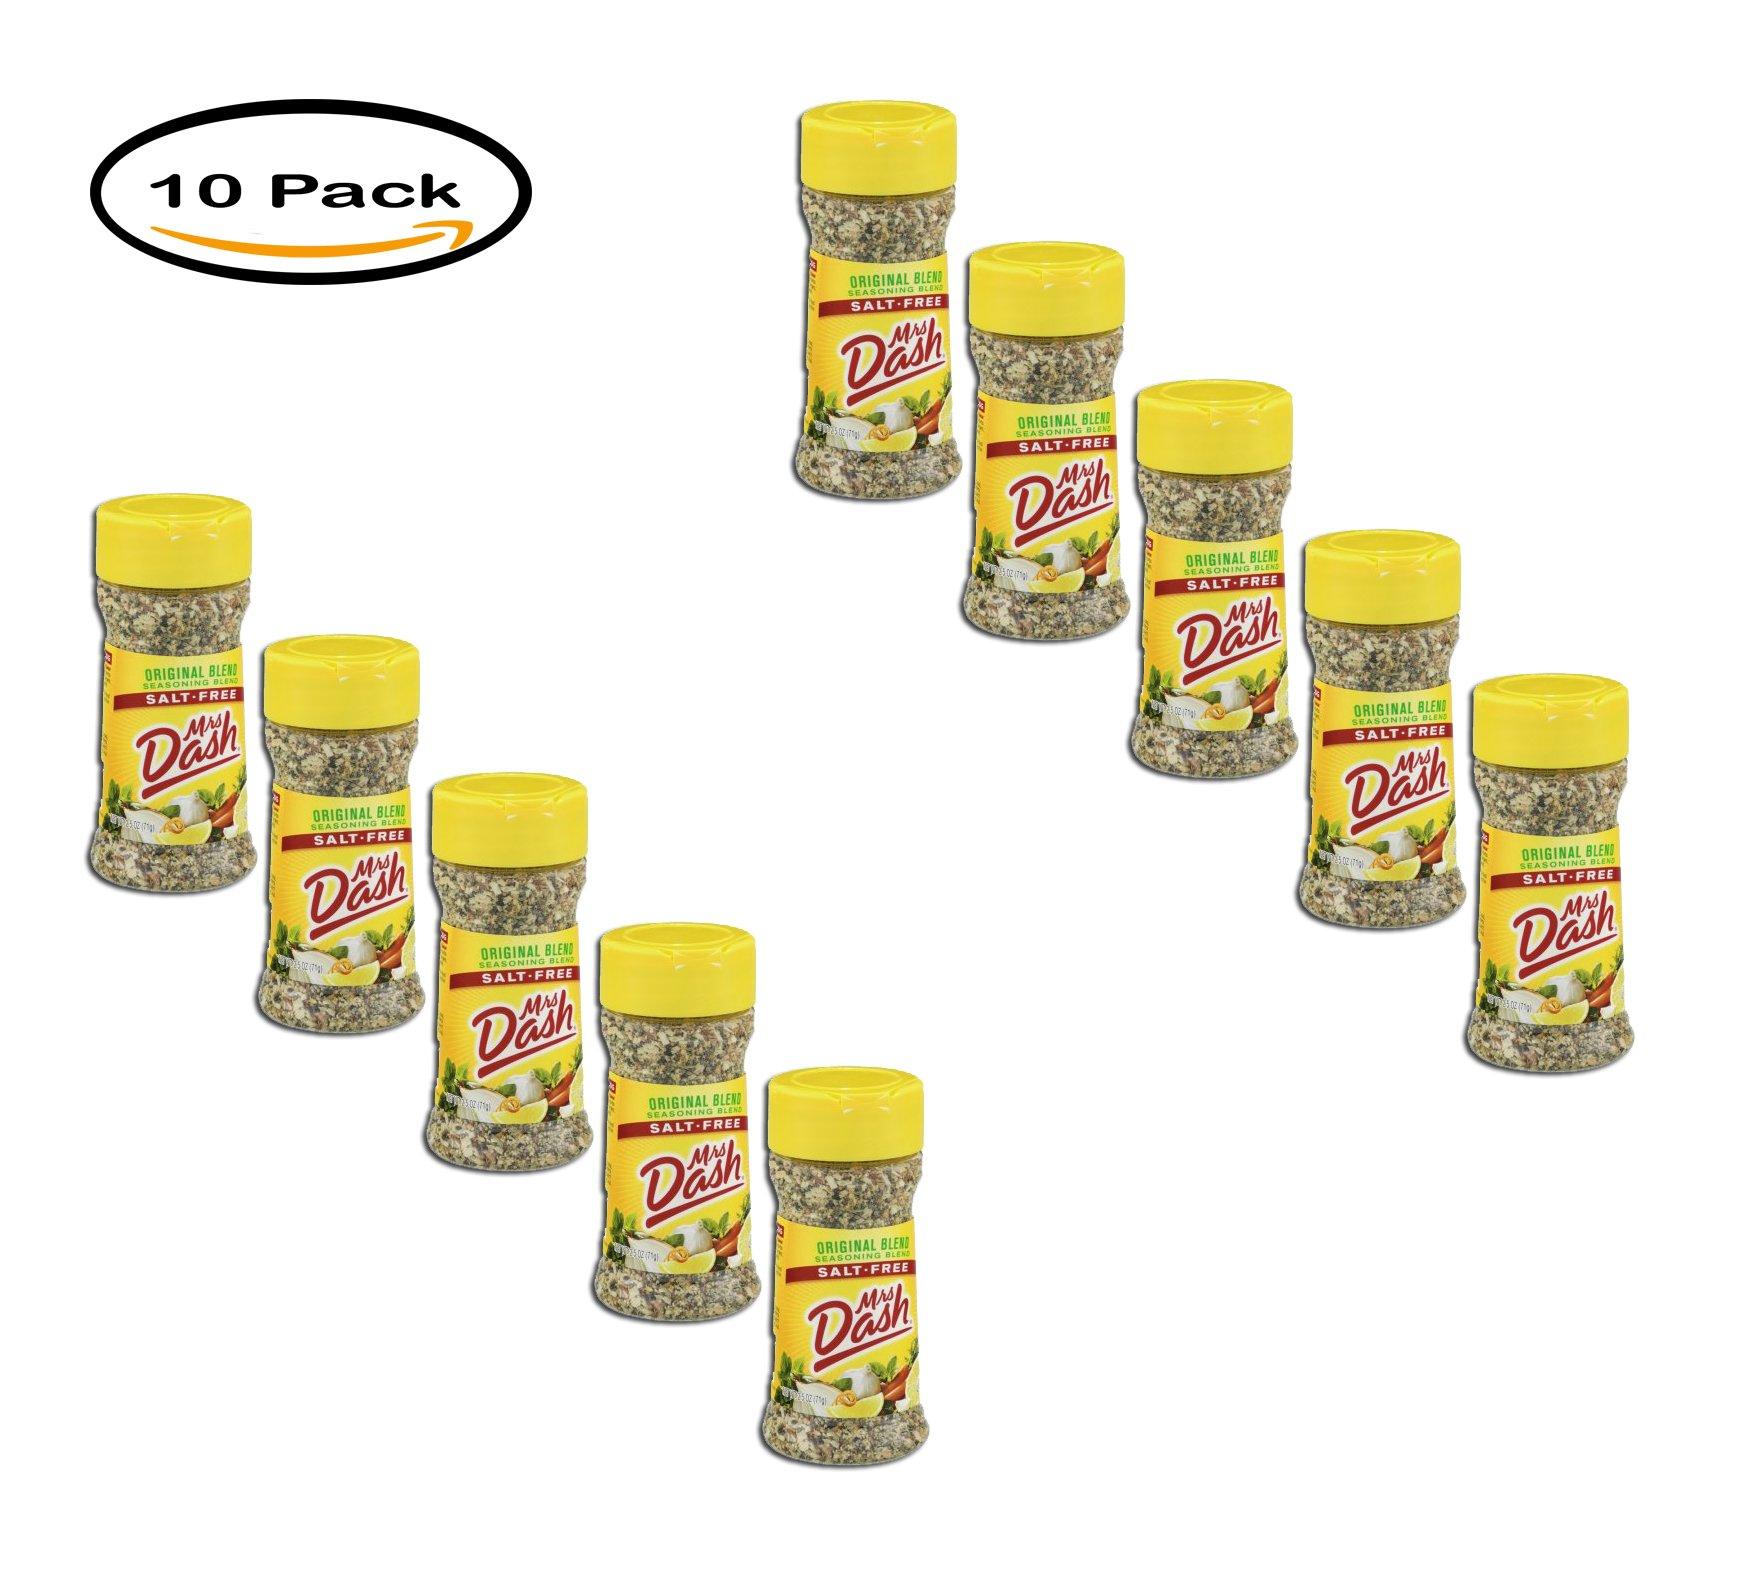 PACK OF 10 - Mrs. Dash Salt-Free Seasoning Blend Original Blend, 2.5 OZ